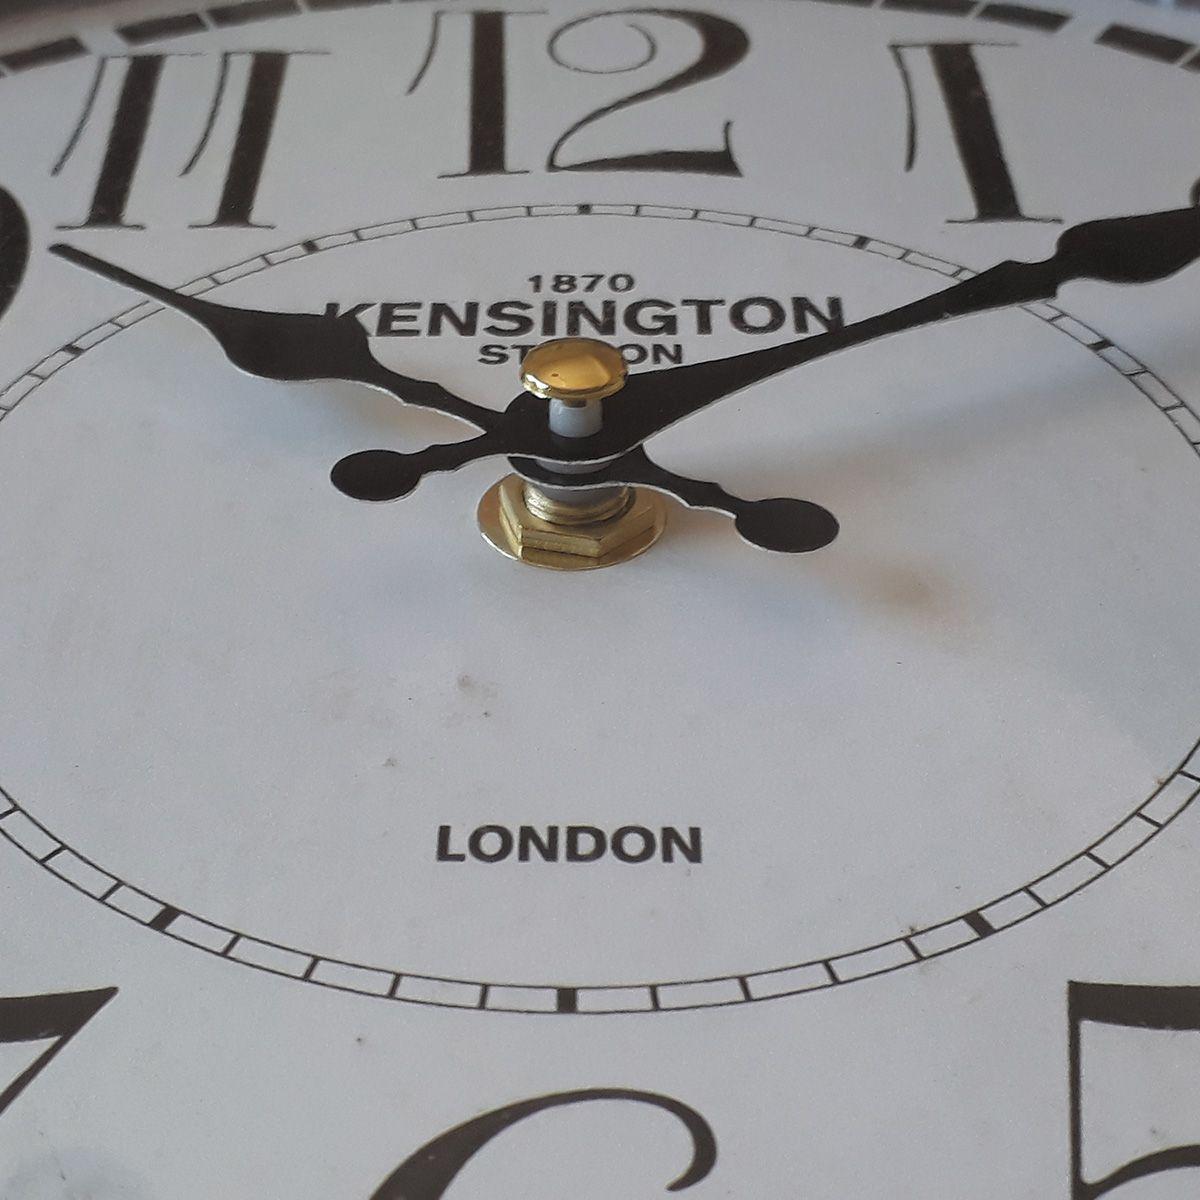 Relógio de parede dupla face Kensington Station London 1870